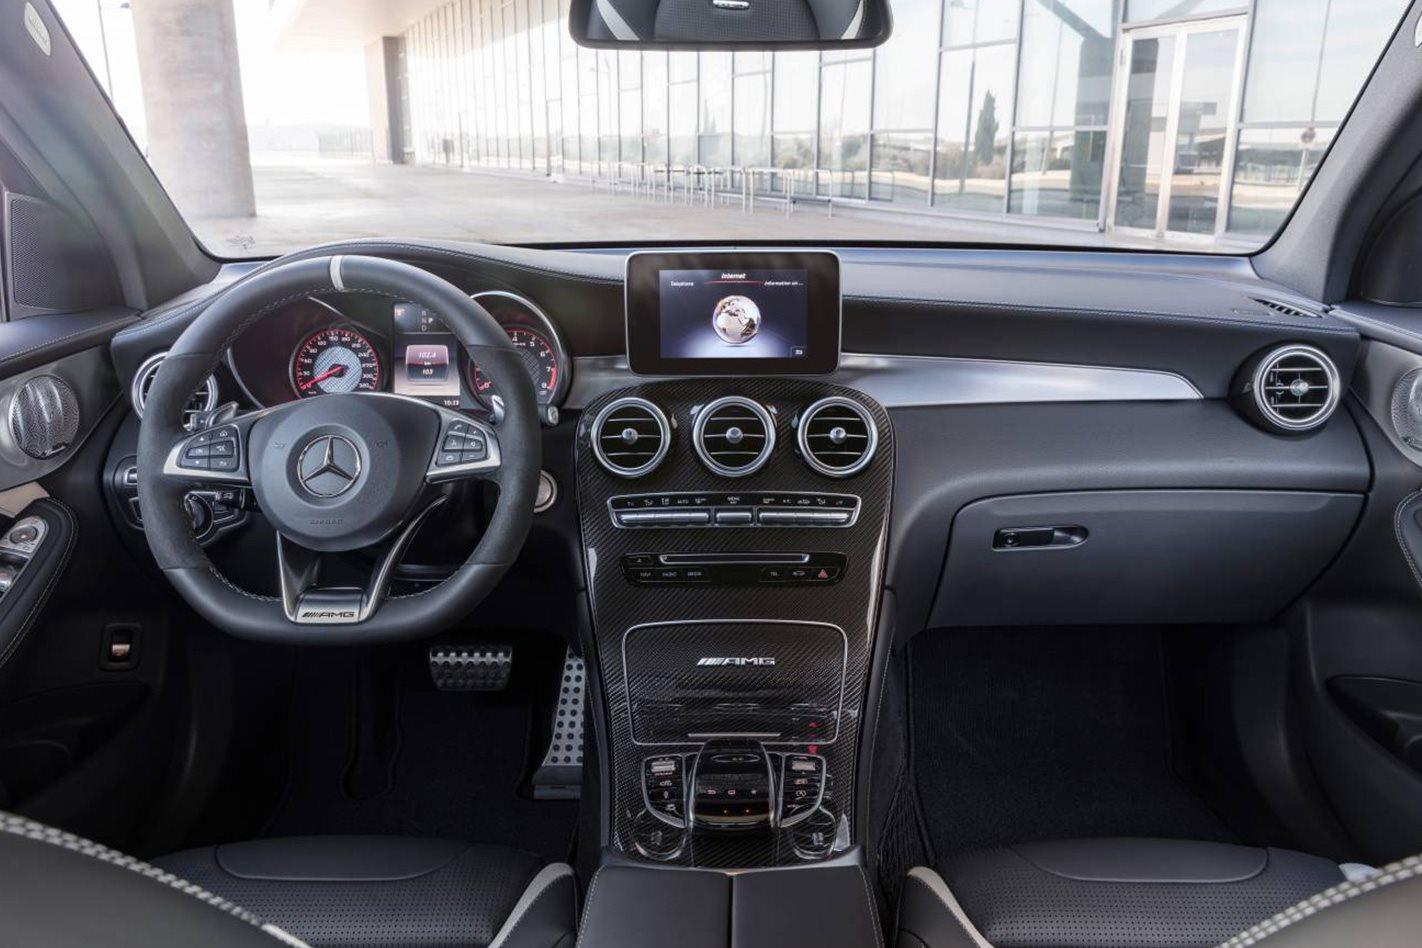 Mercedes-AMG GLC63 S interior